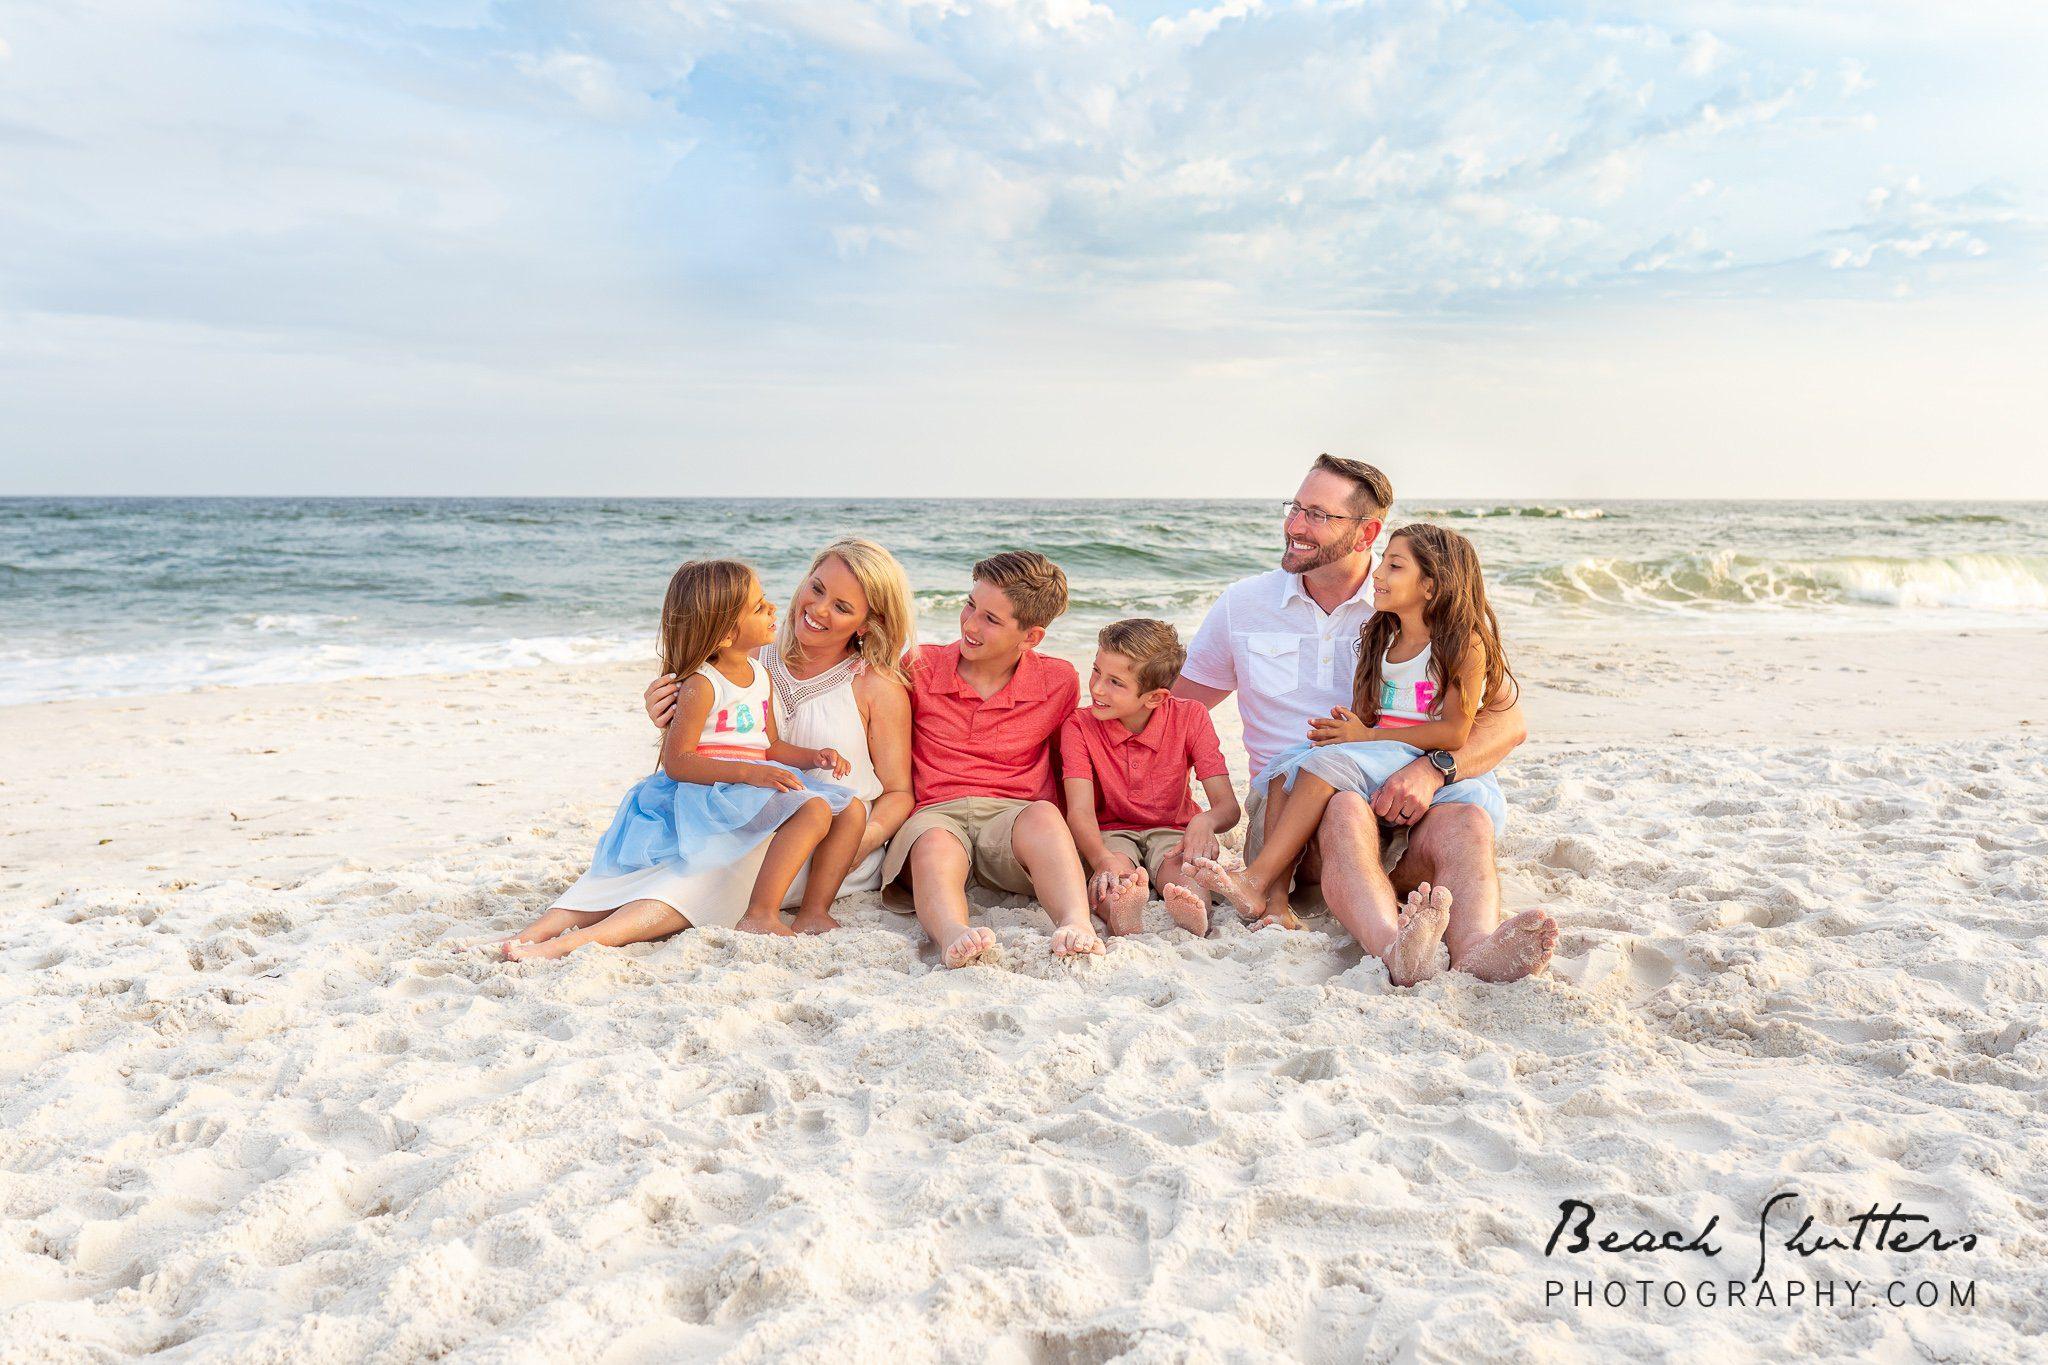 Alabama beach photographers